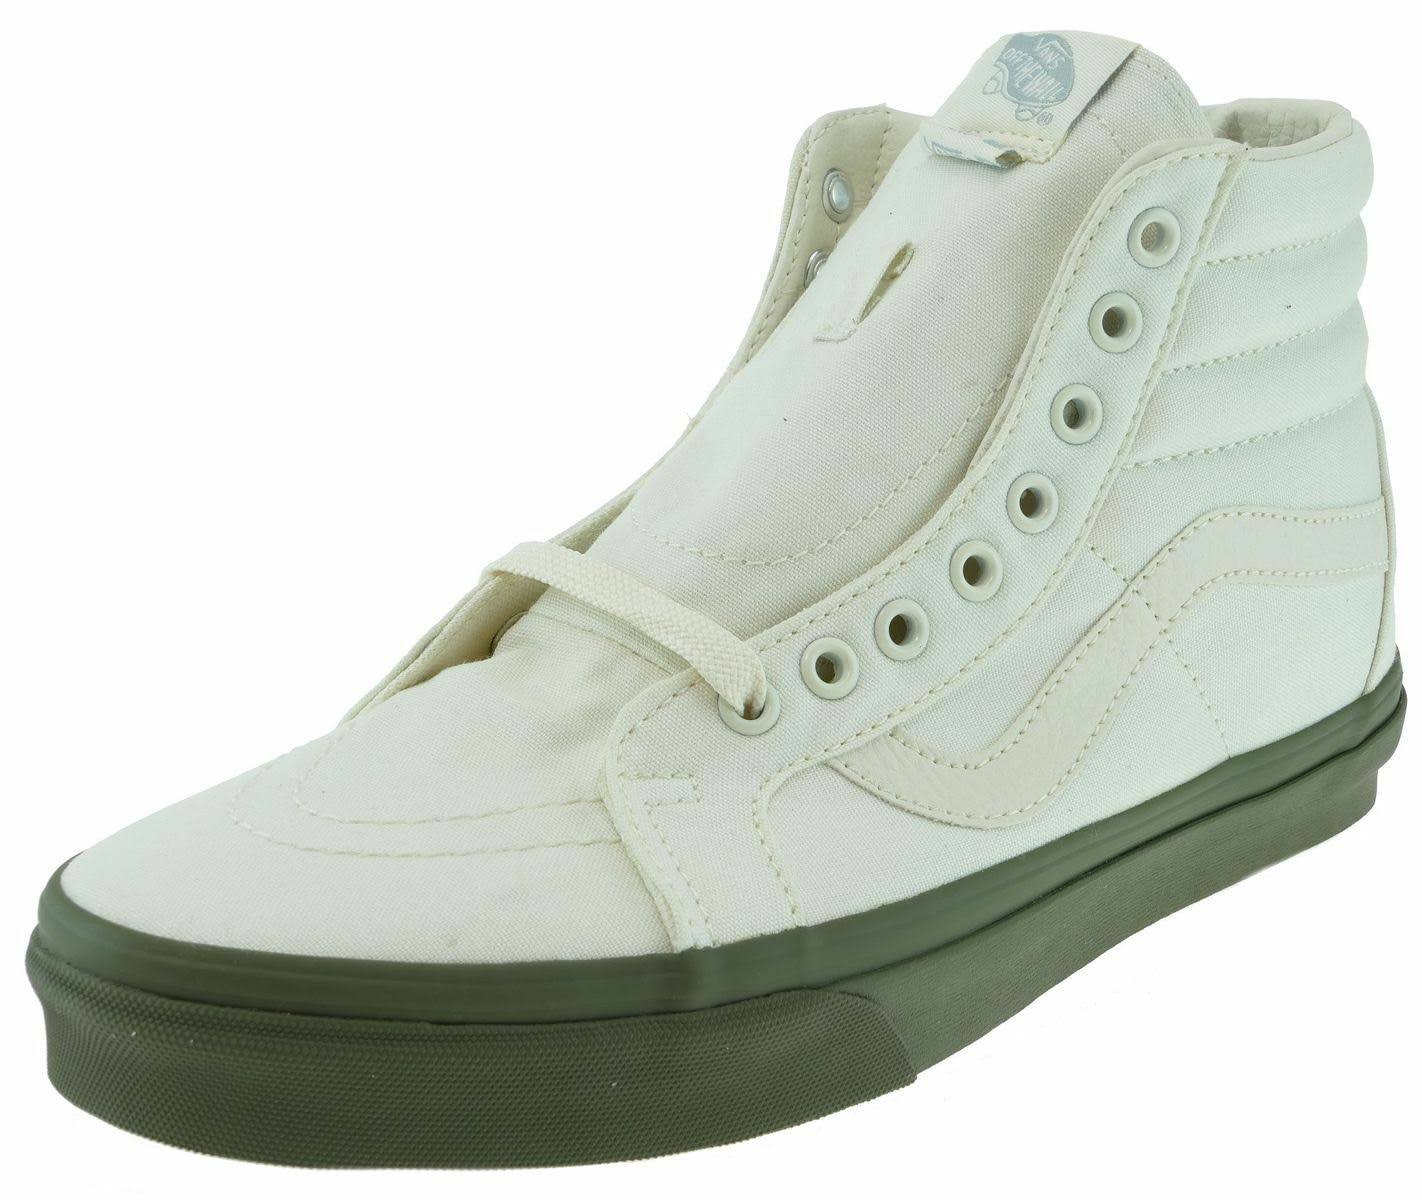 ivygreen Vans Reissue Green Ivy hi White Sk8 Classics Classic Vansguard 43 Gr Vansguardclassicwhite 66gw7qxr